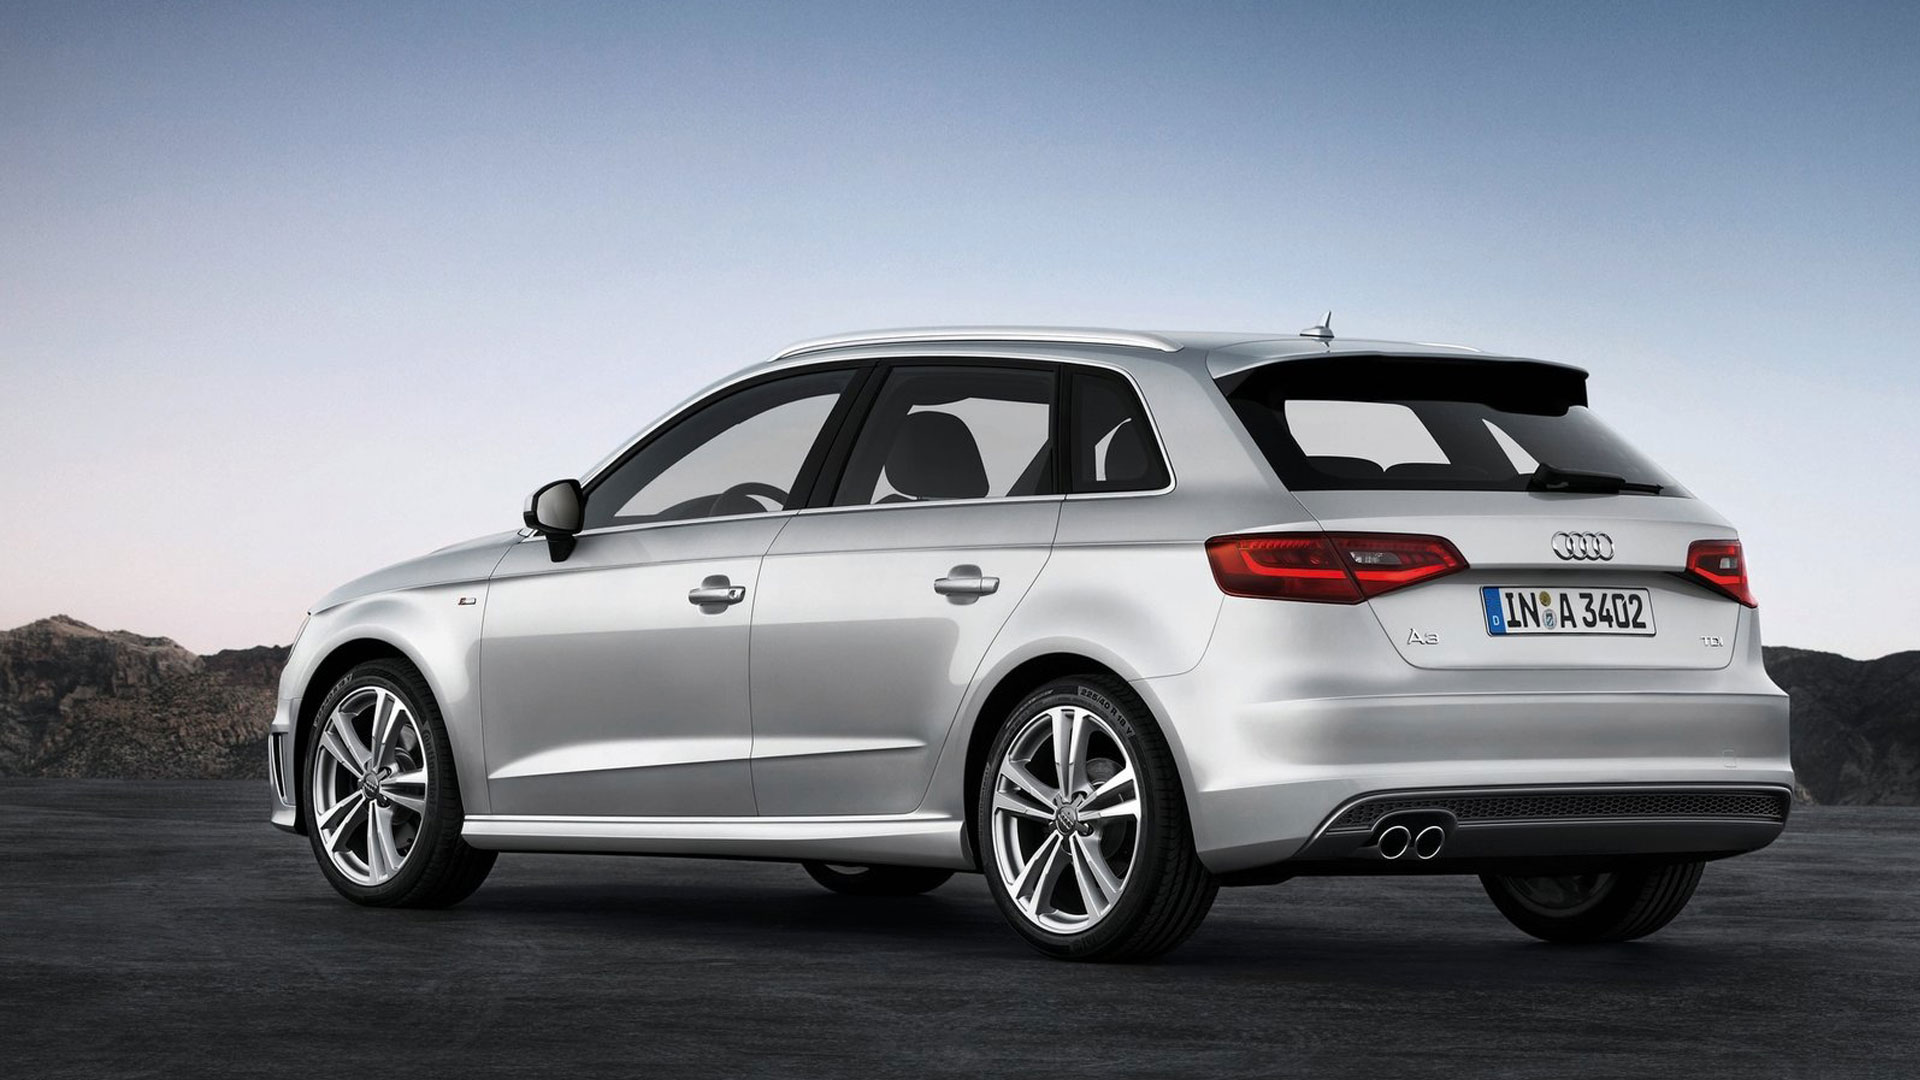 2014 Audi A3 Sportback S Line HD Wallpaper